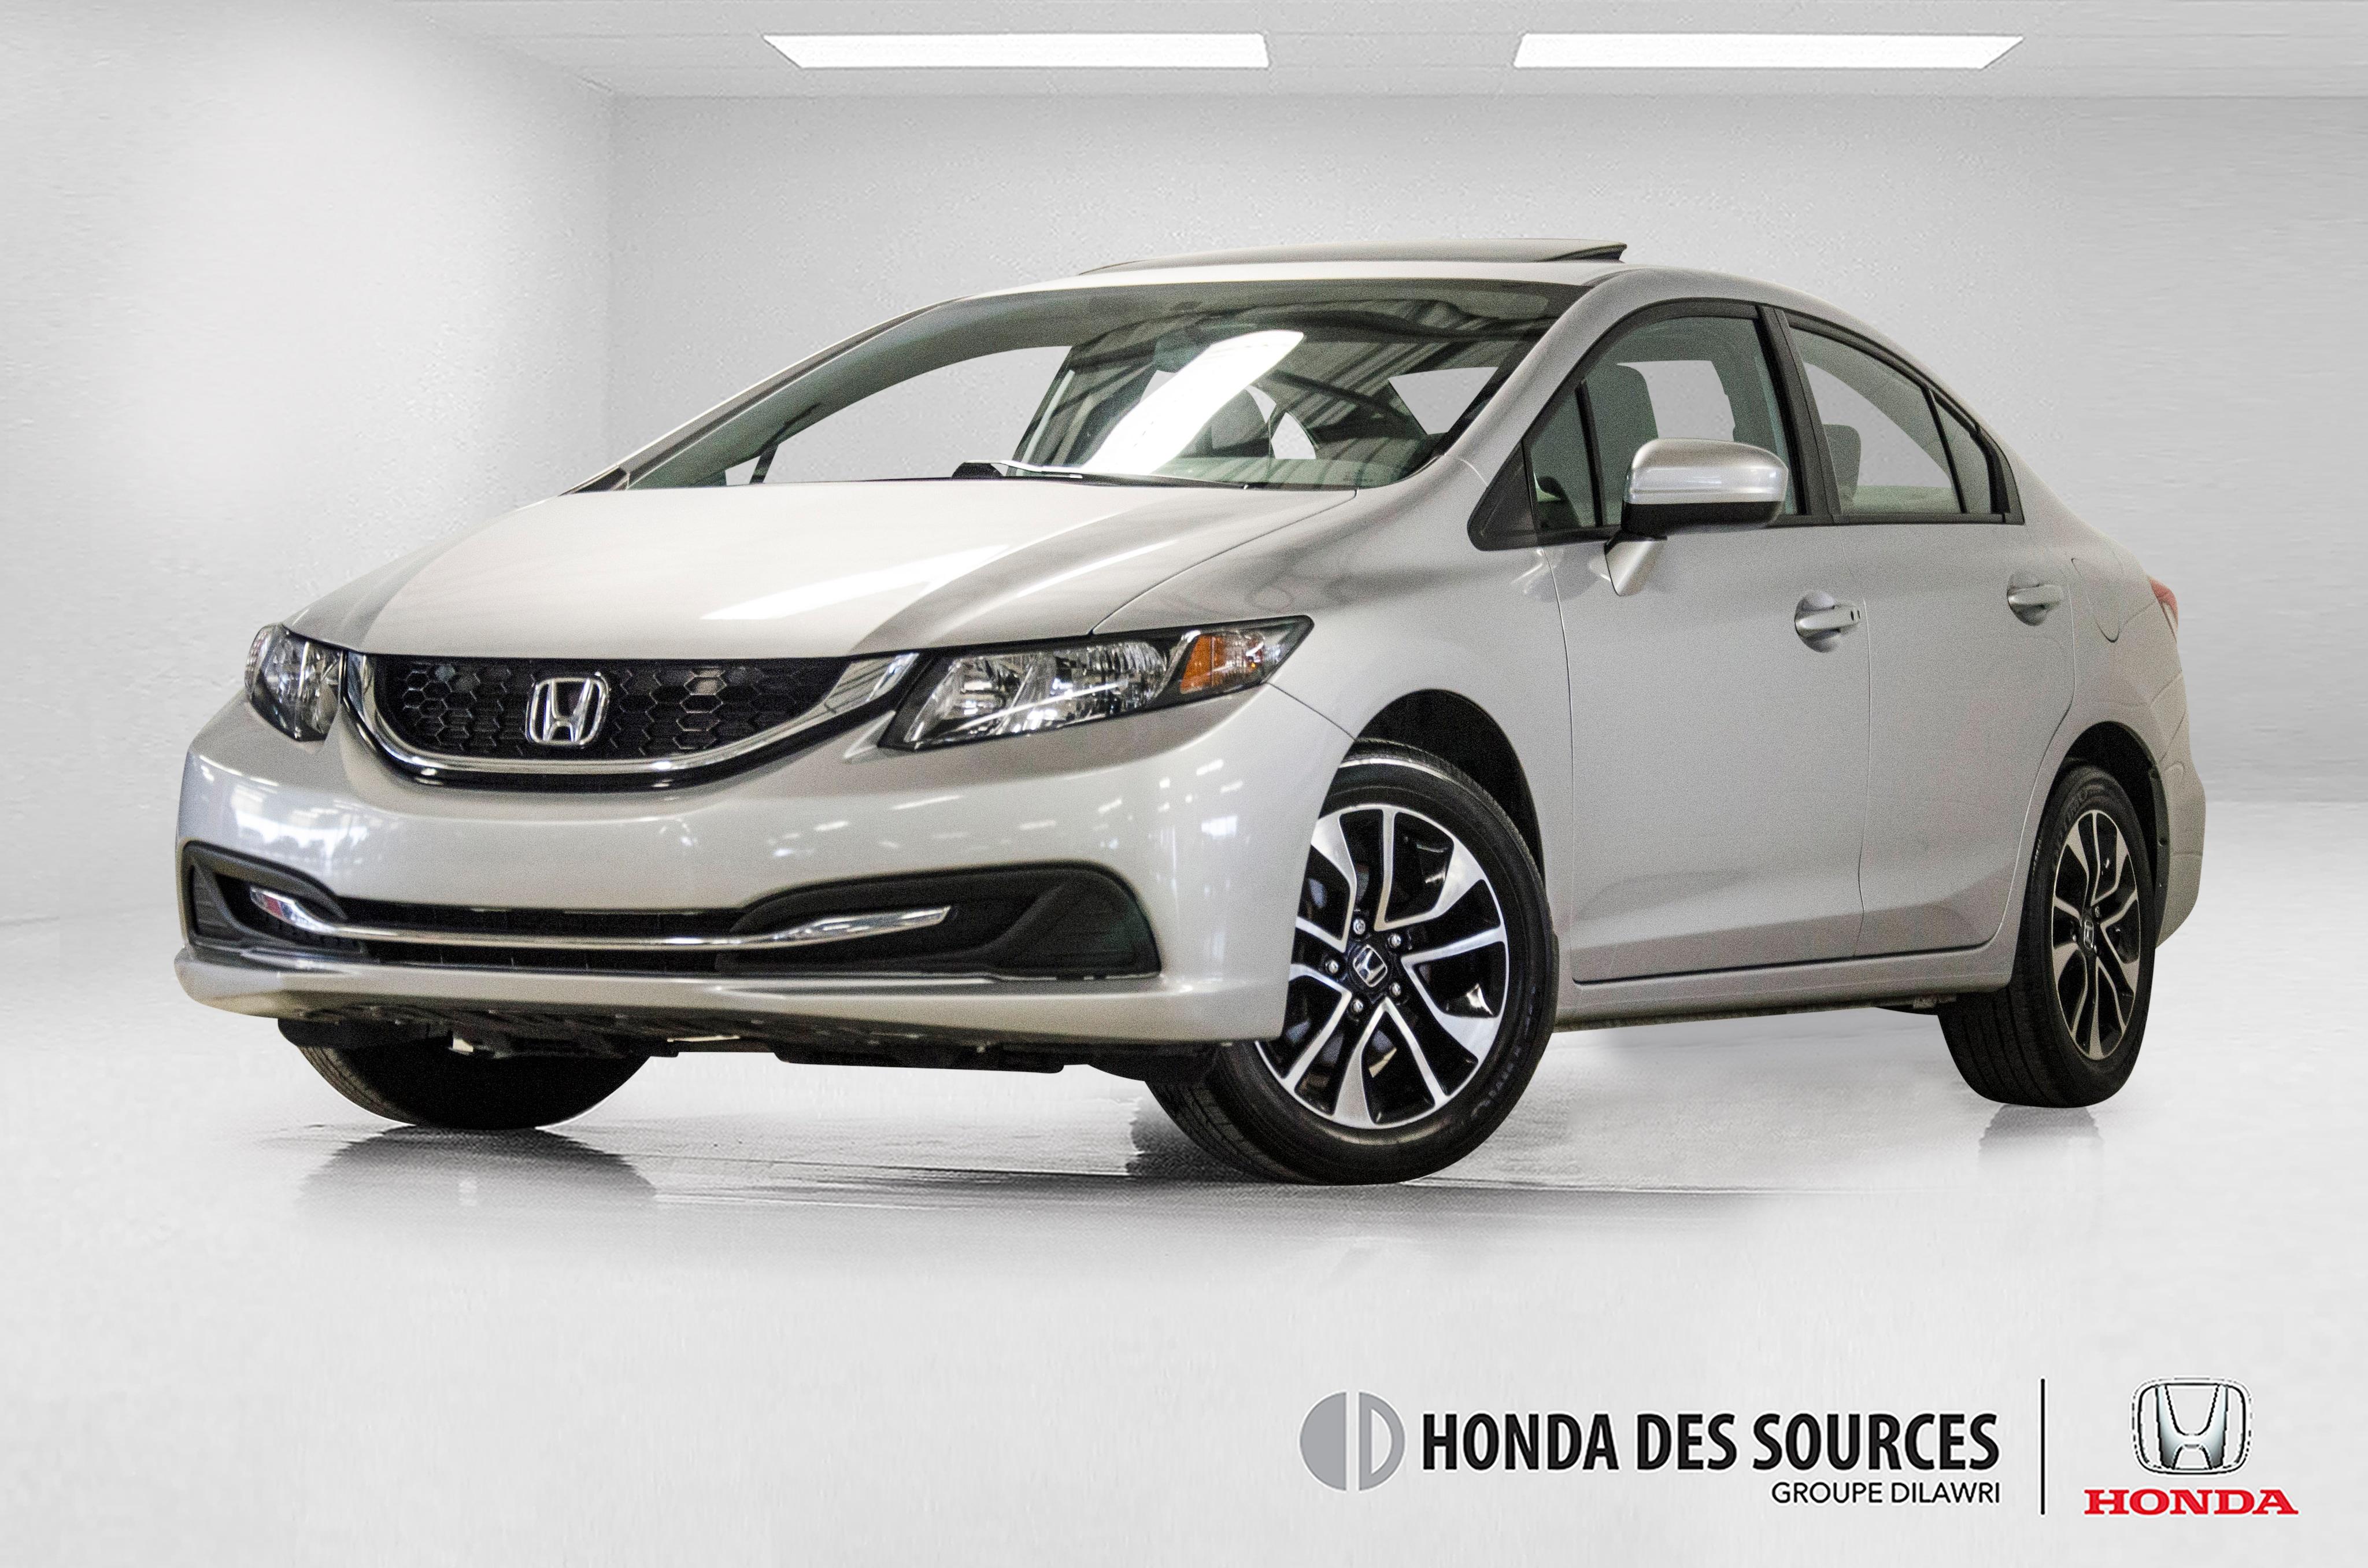 2015 Honda Civic EX  * Push Start * Sièges Chauffants * 2 Caméras * Berline